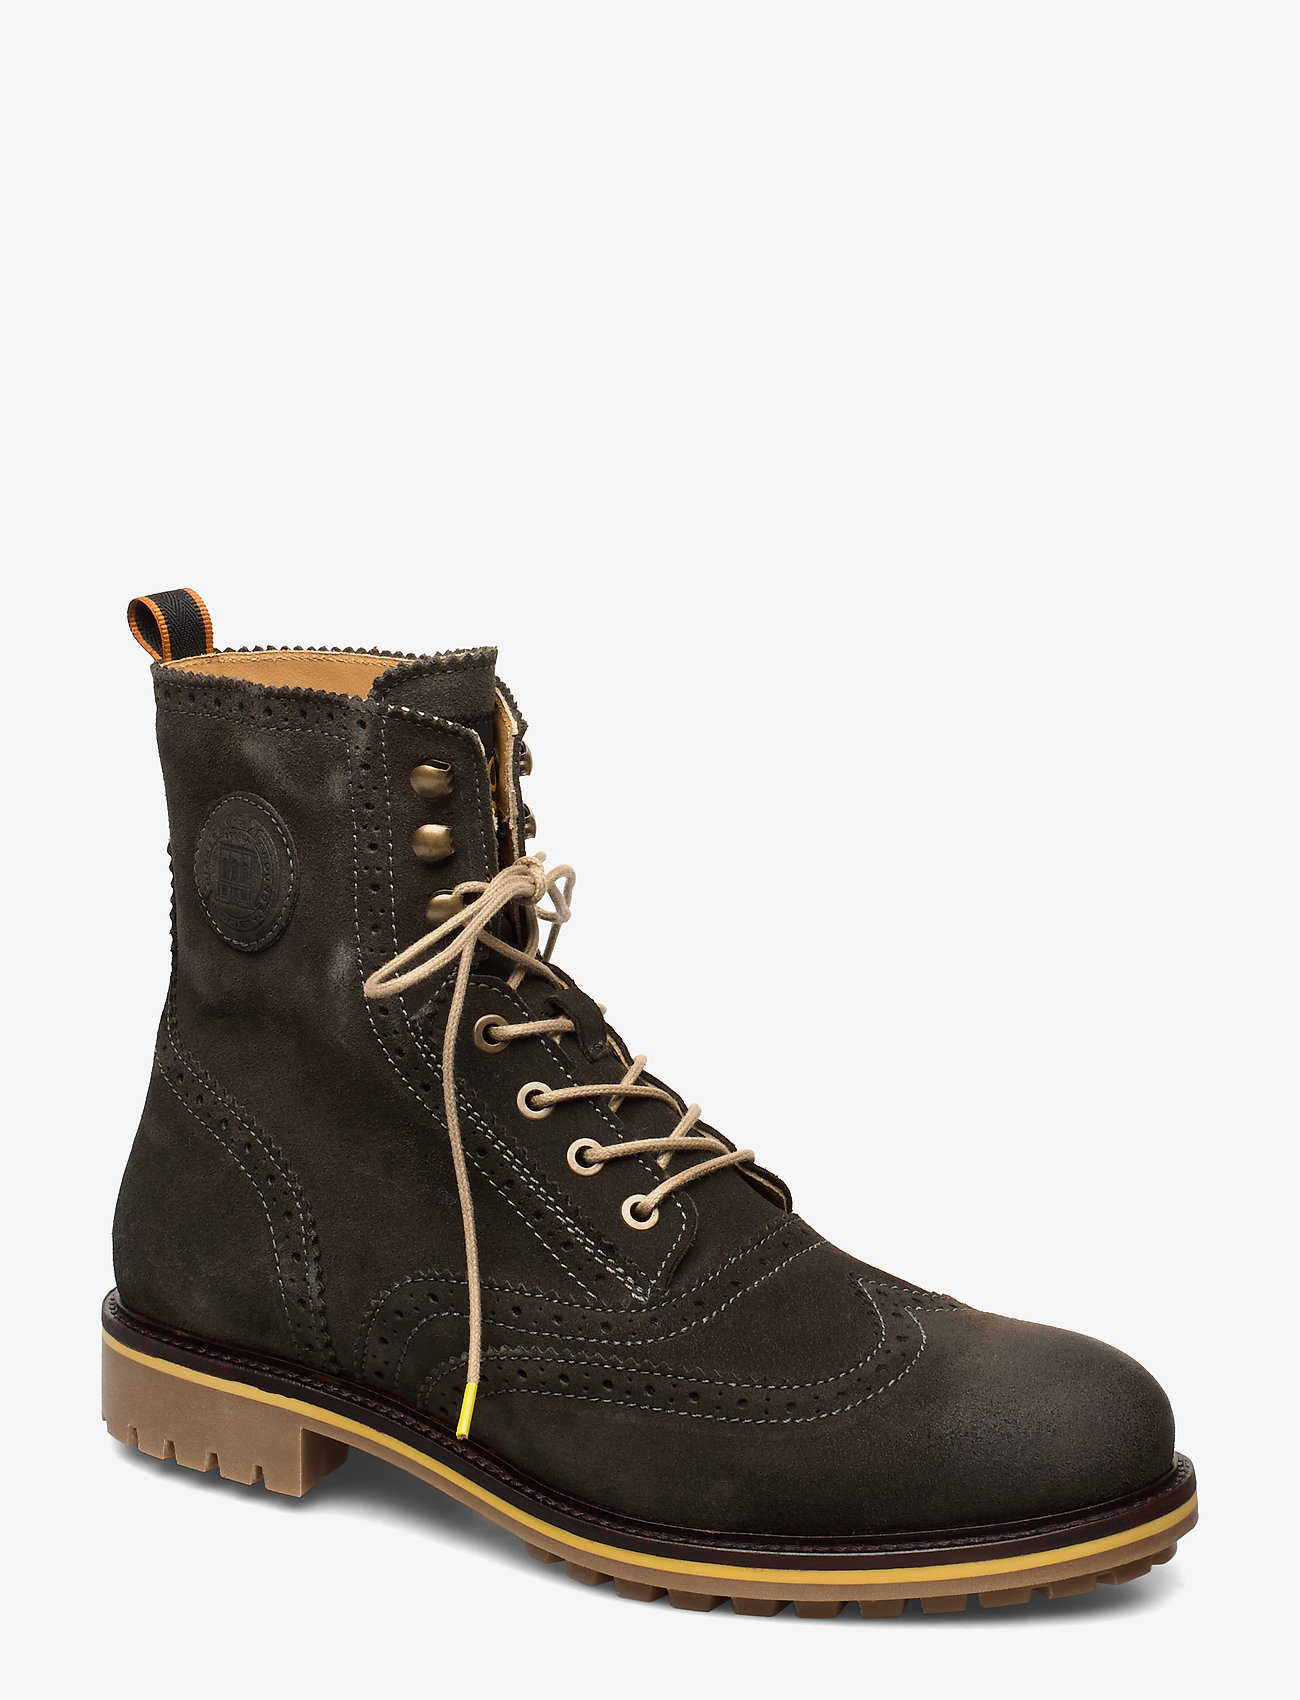 Scotch & Soda Shoes - Borrel Mid laceboot - bottes lacées - forest green - 0